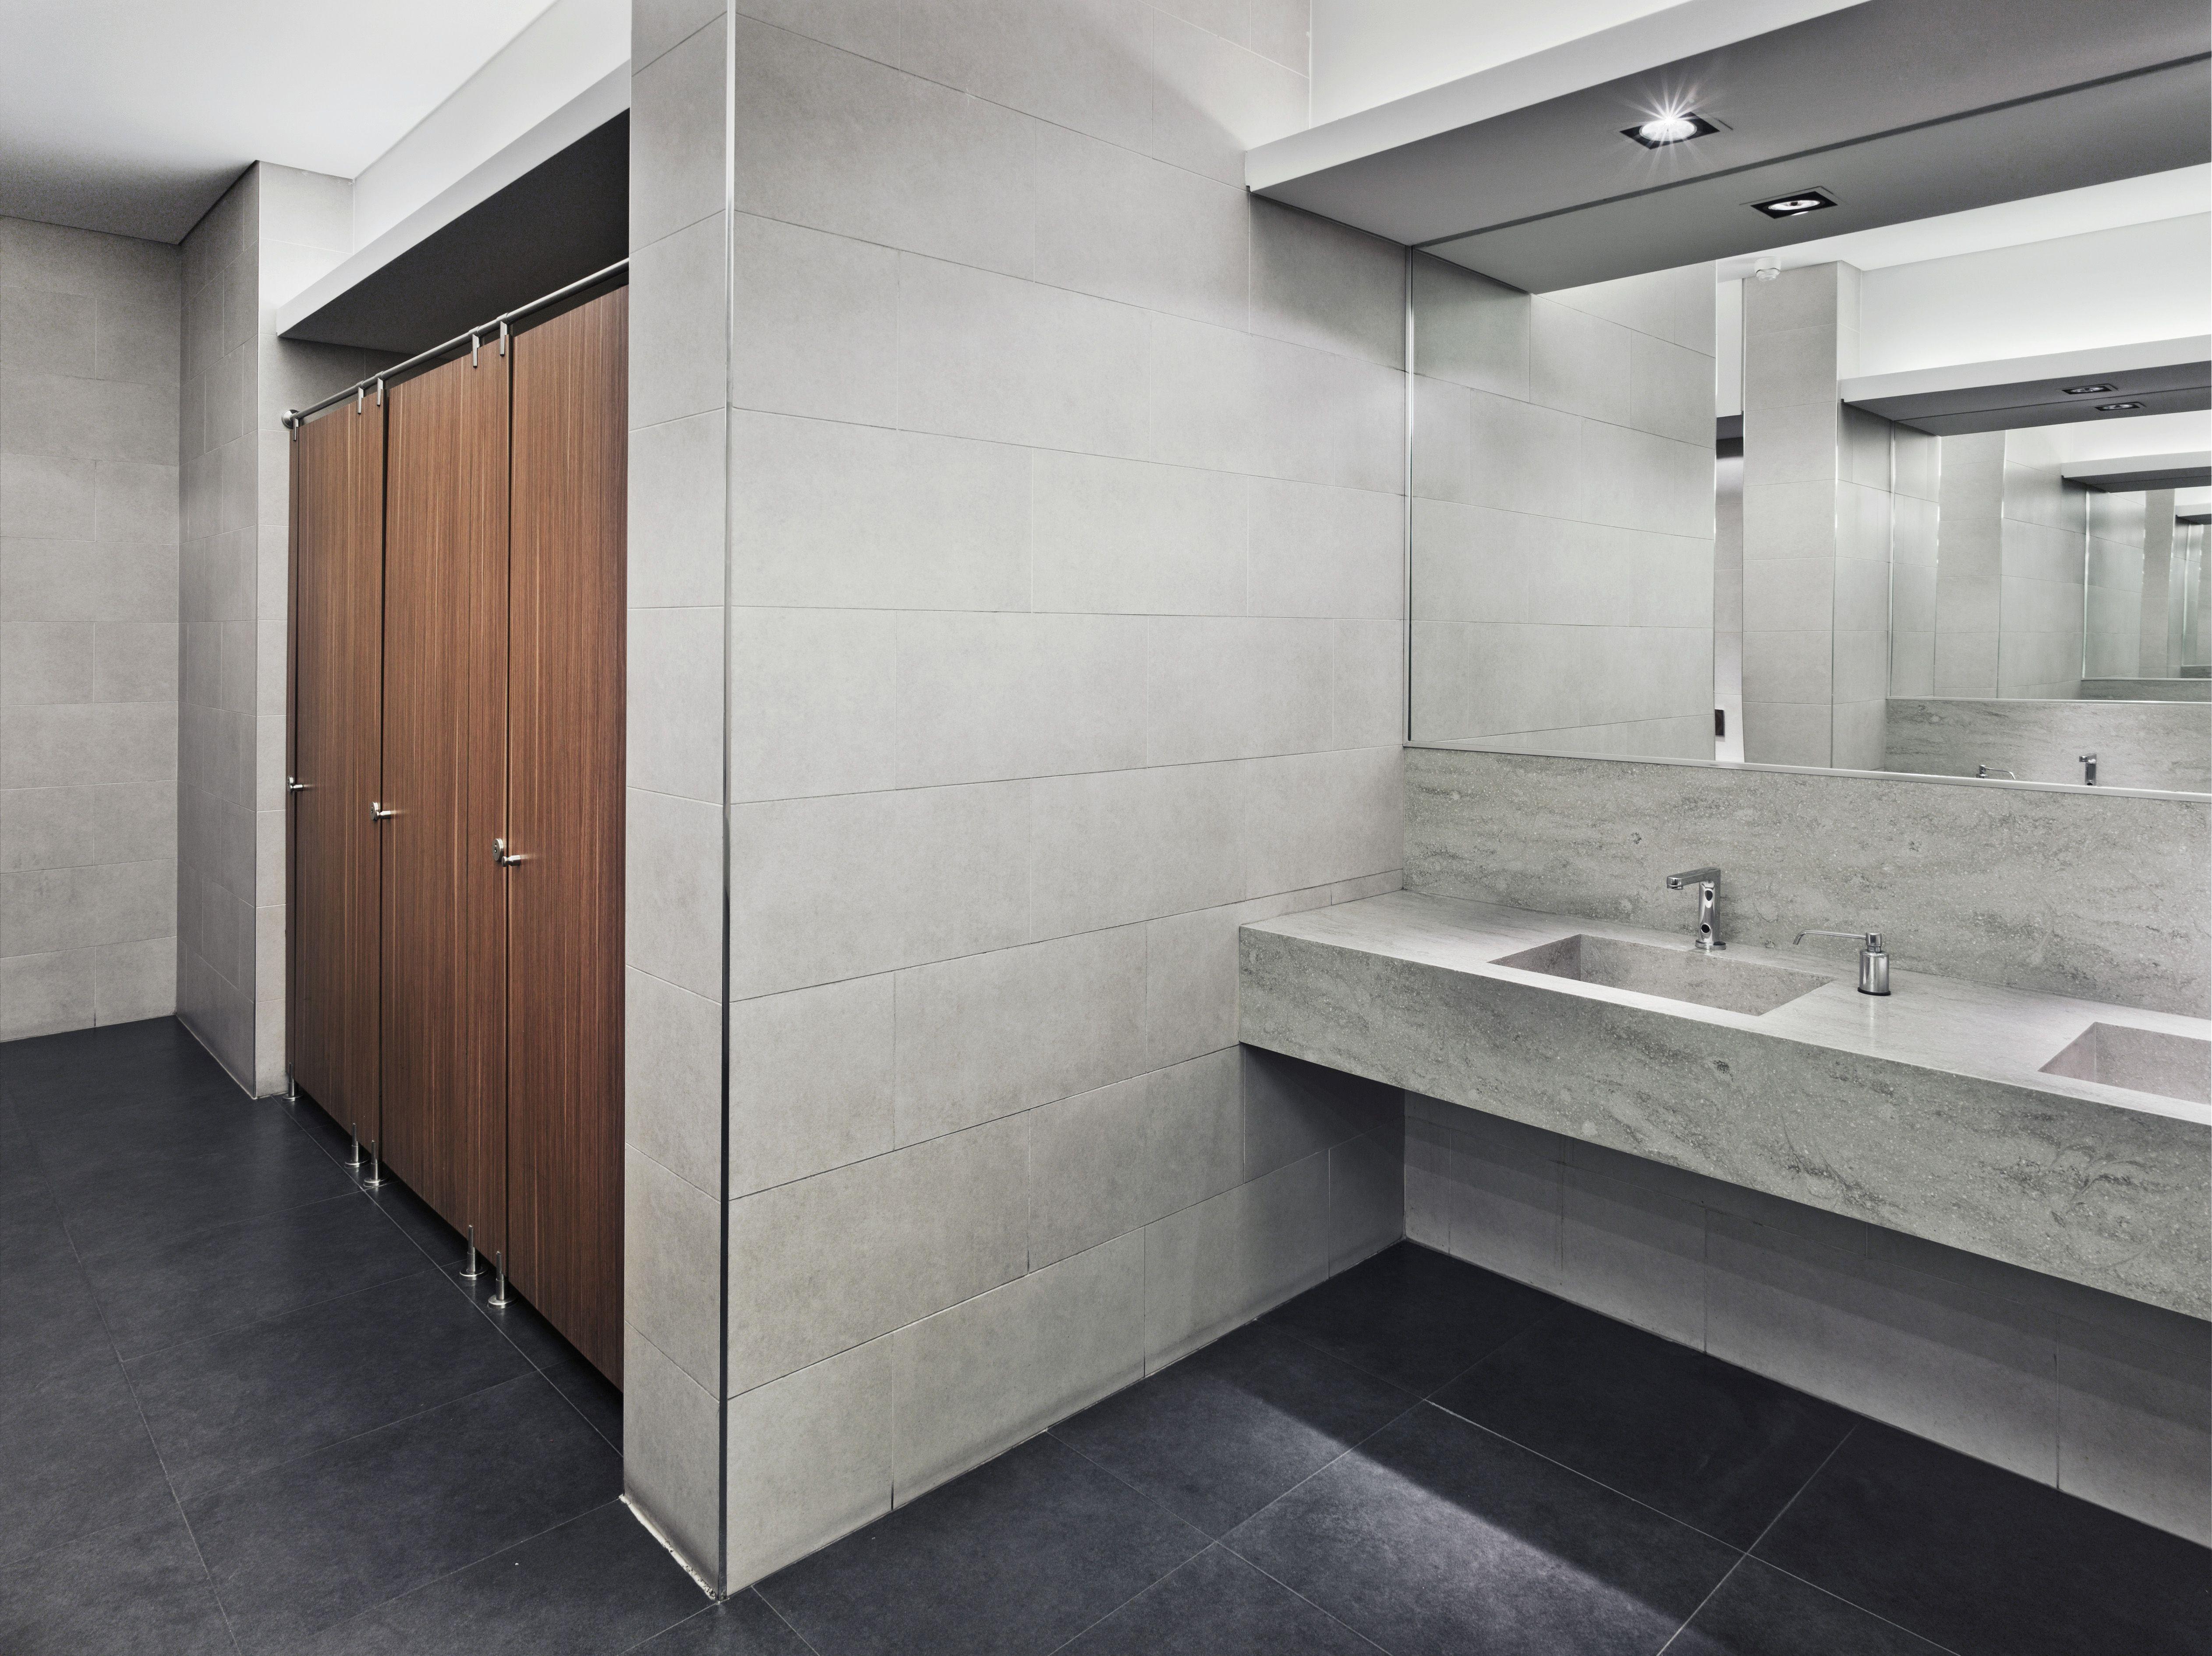 Bathroom Flooring Options New the 7 Best Bathroom Flooring Materials Photograph